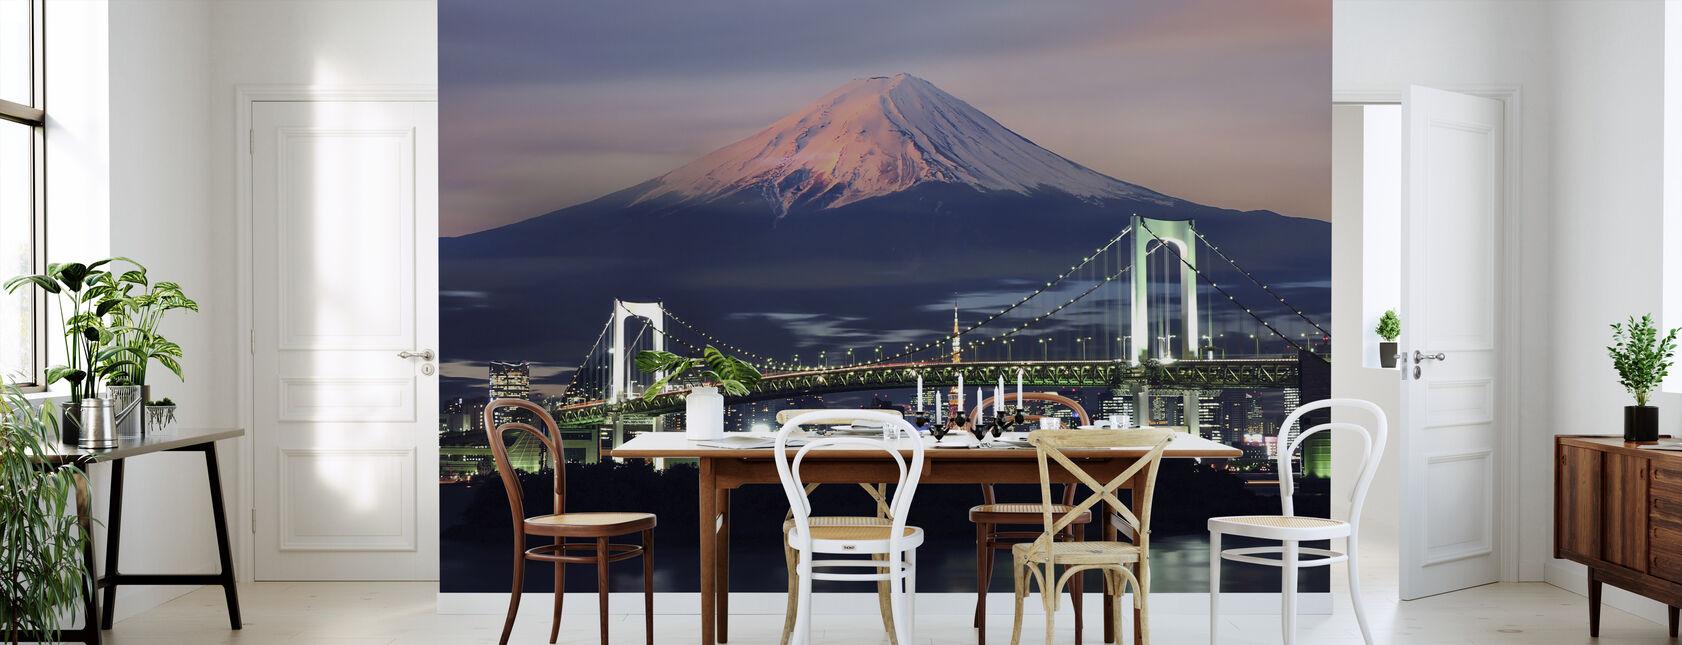 Rainbow Bridge with Mt Fuji - Wallpaper - Kitchen